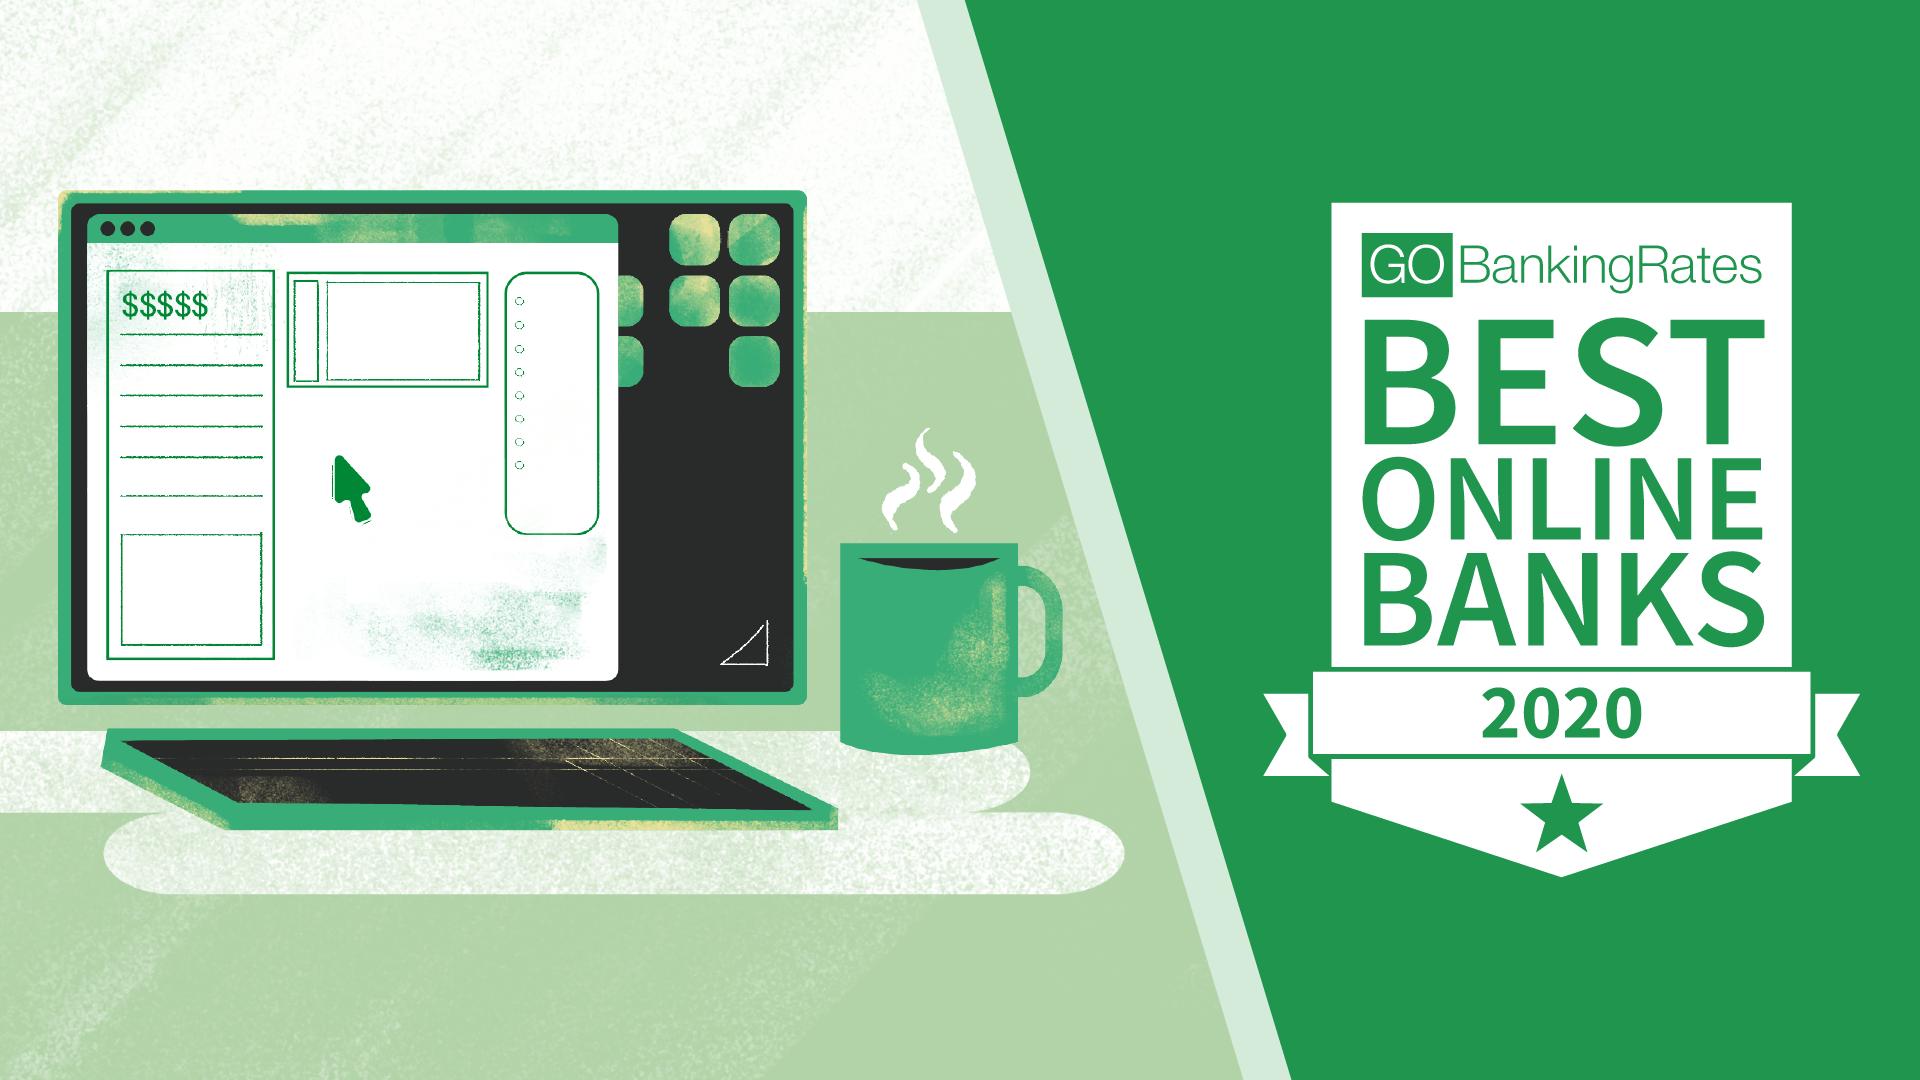 Best Online Banks 2020.Best Online Banks 2020 Enhanced Services High Apys